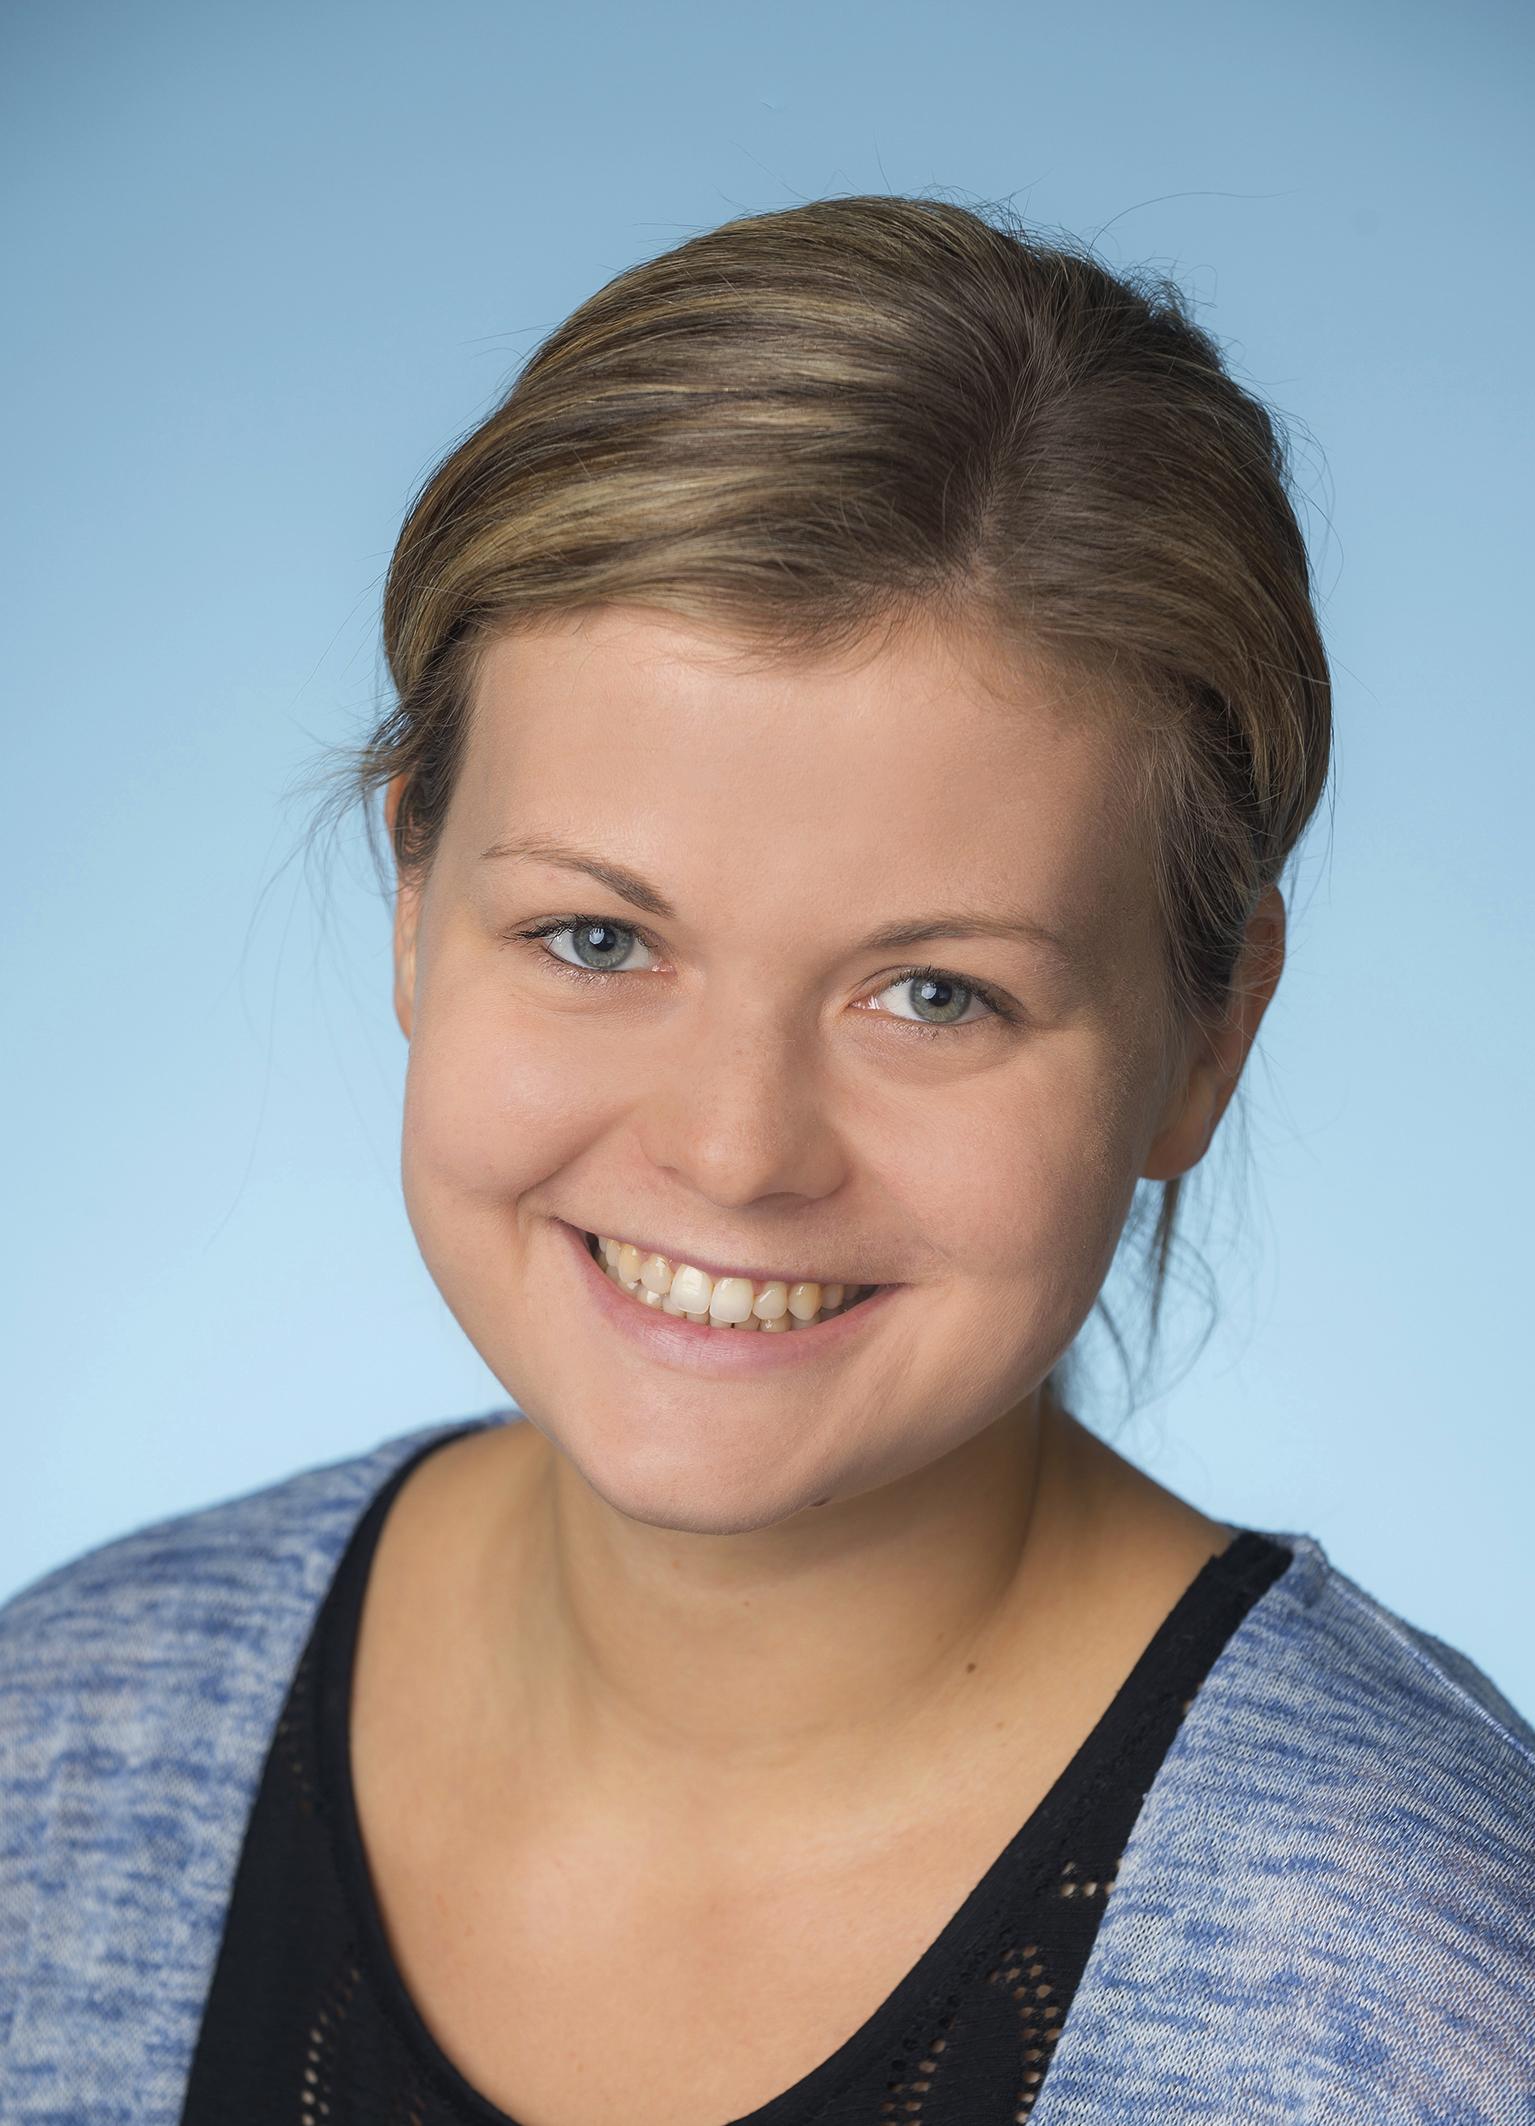 Sabrina Dreier